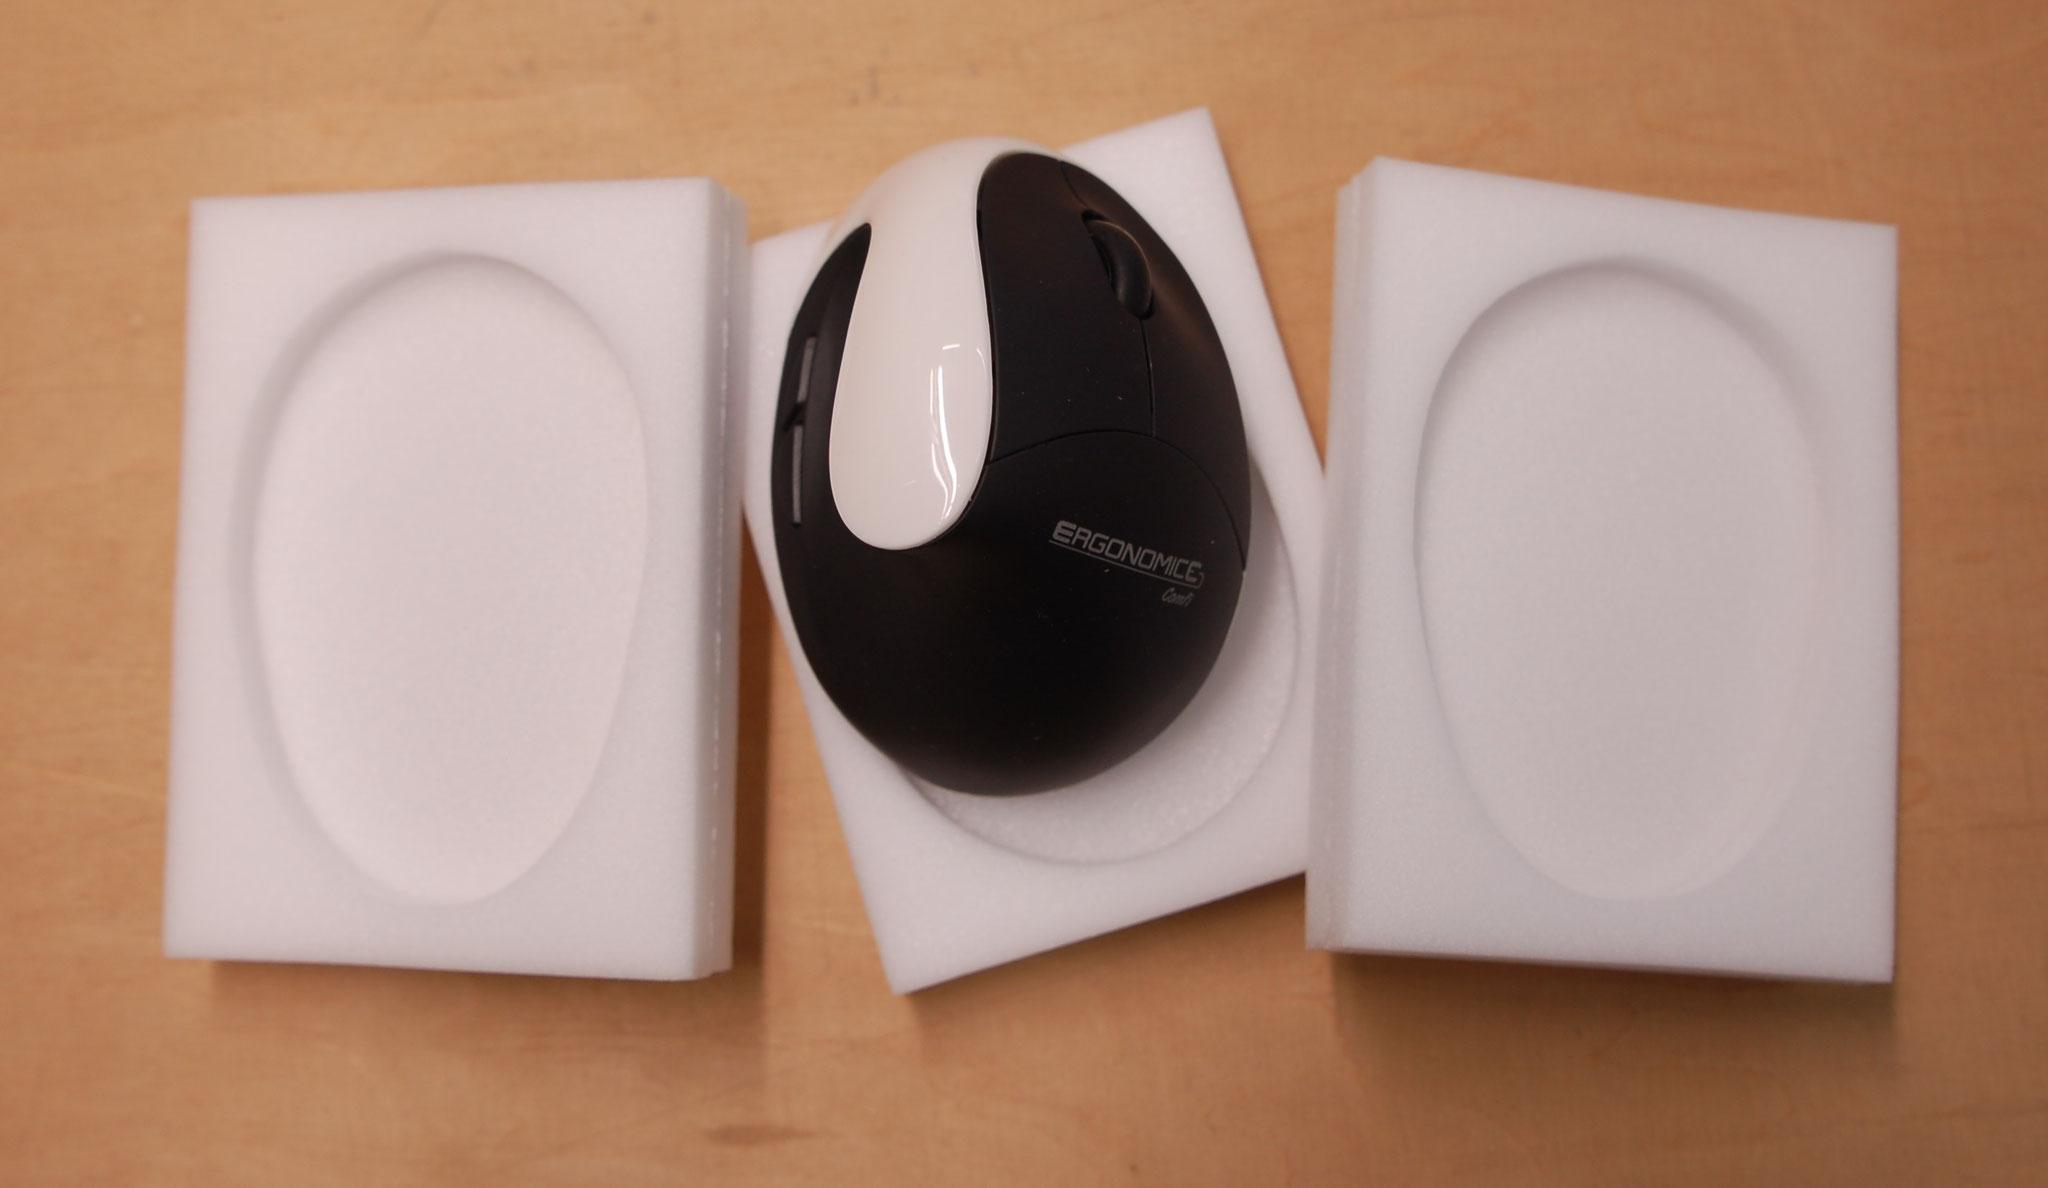 Polster für Mouse